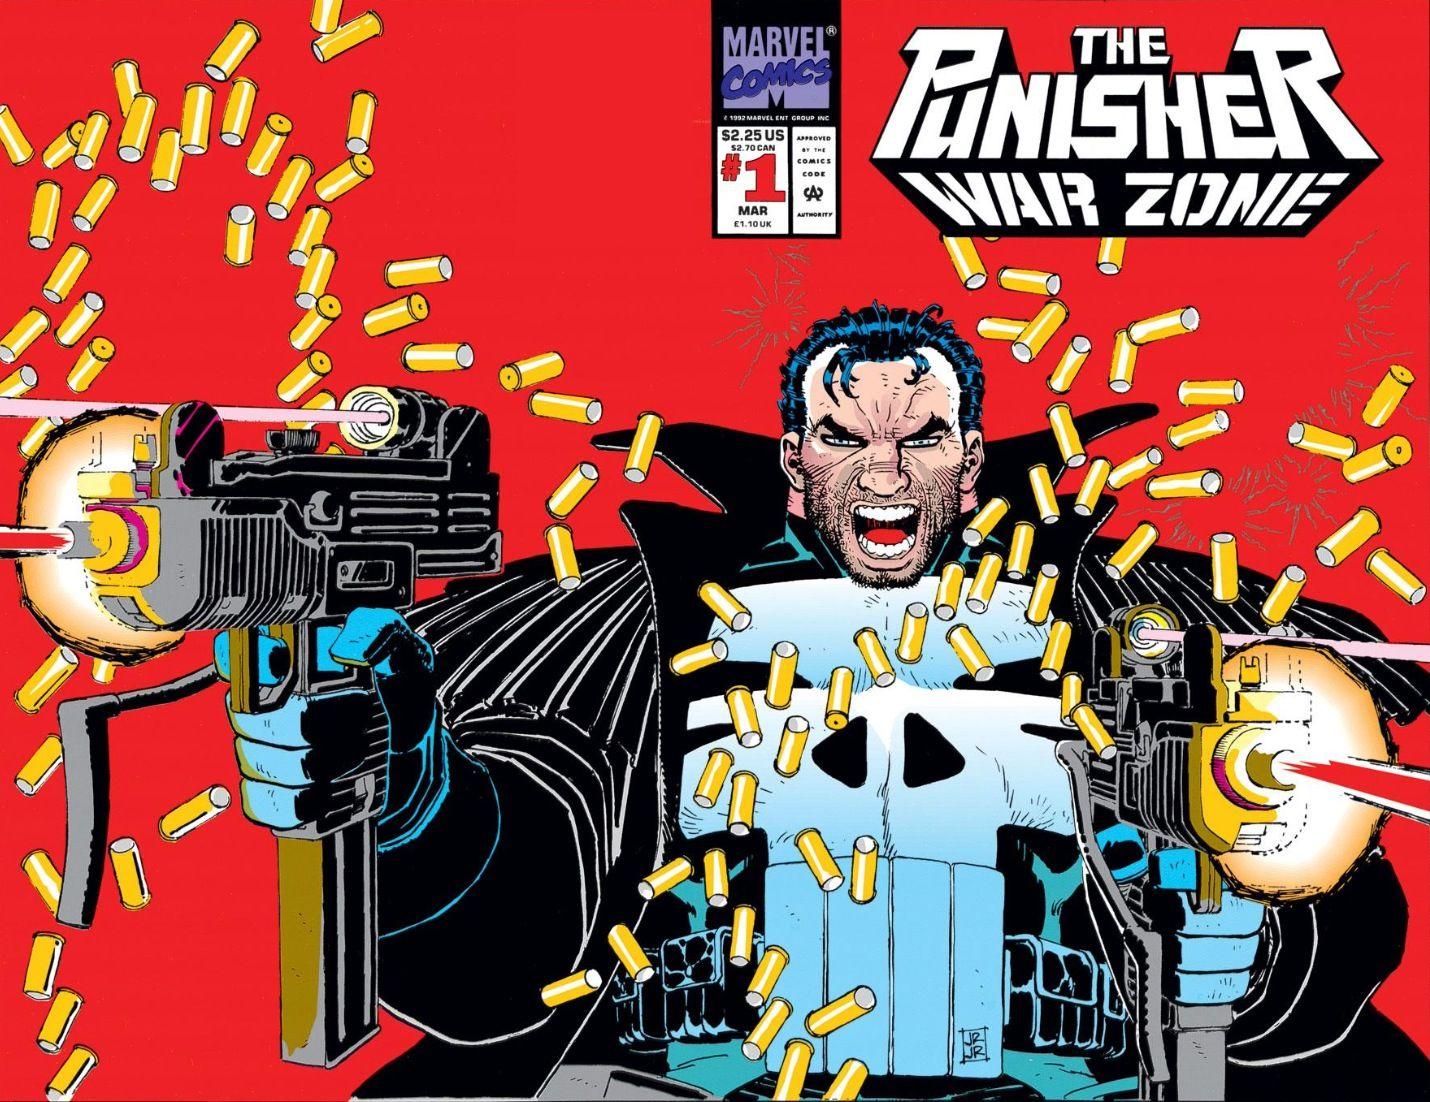 Punisher War Zone # 1 by John Romita Jr.